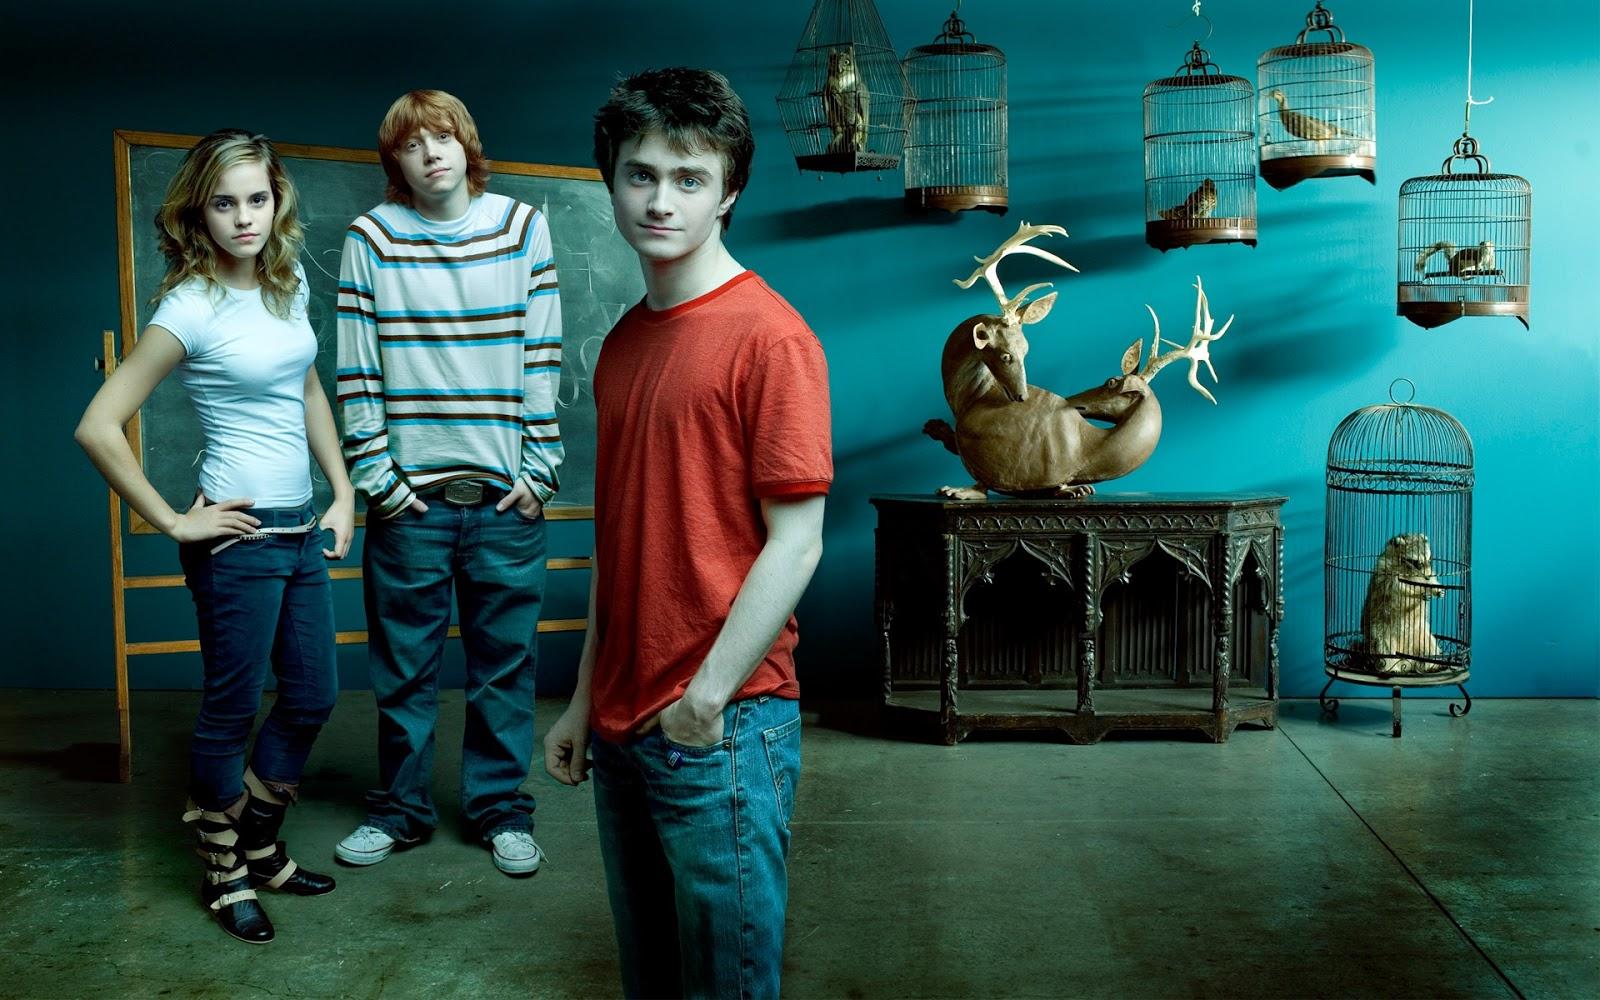 Emma Watson with Harry Potter Movie Crew